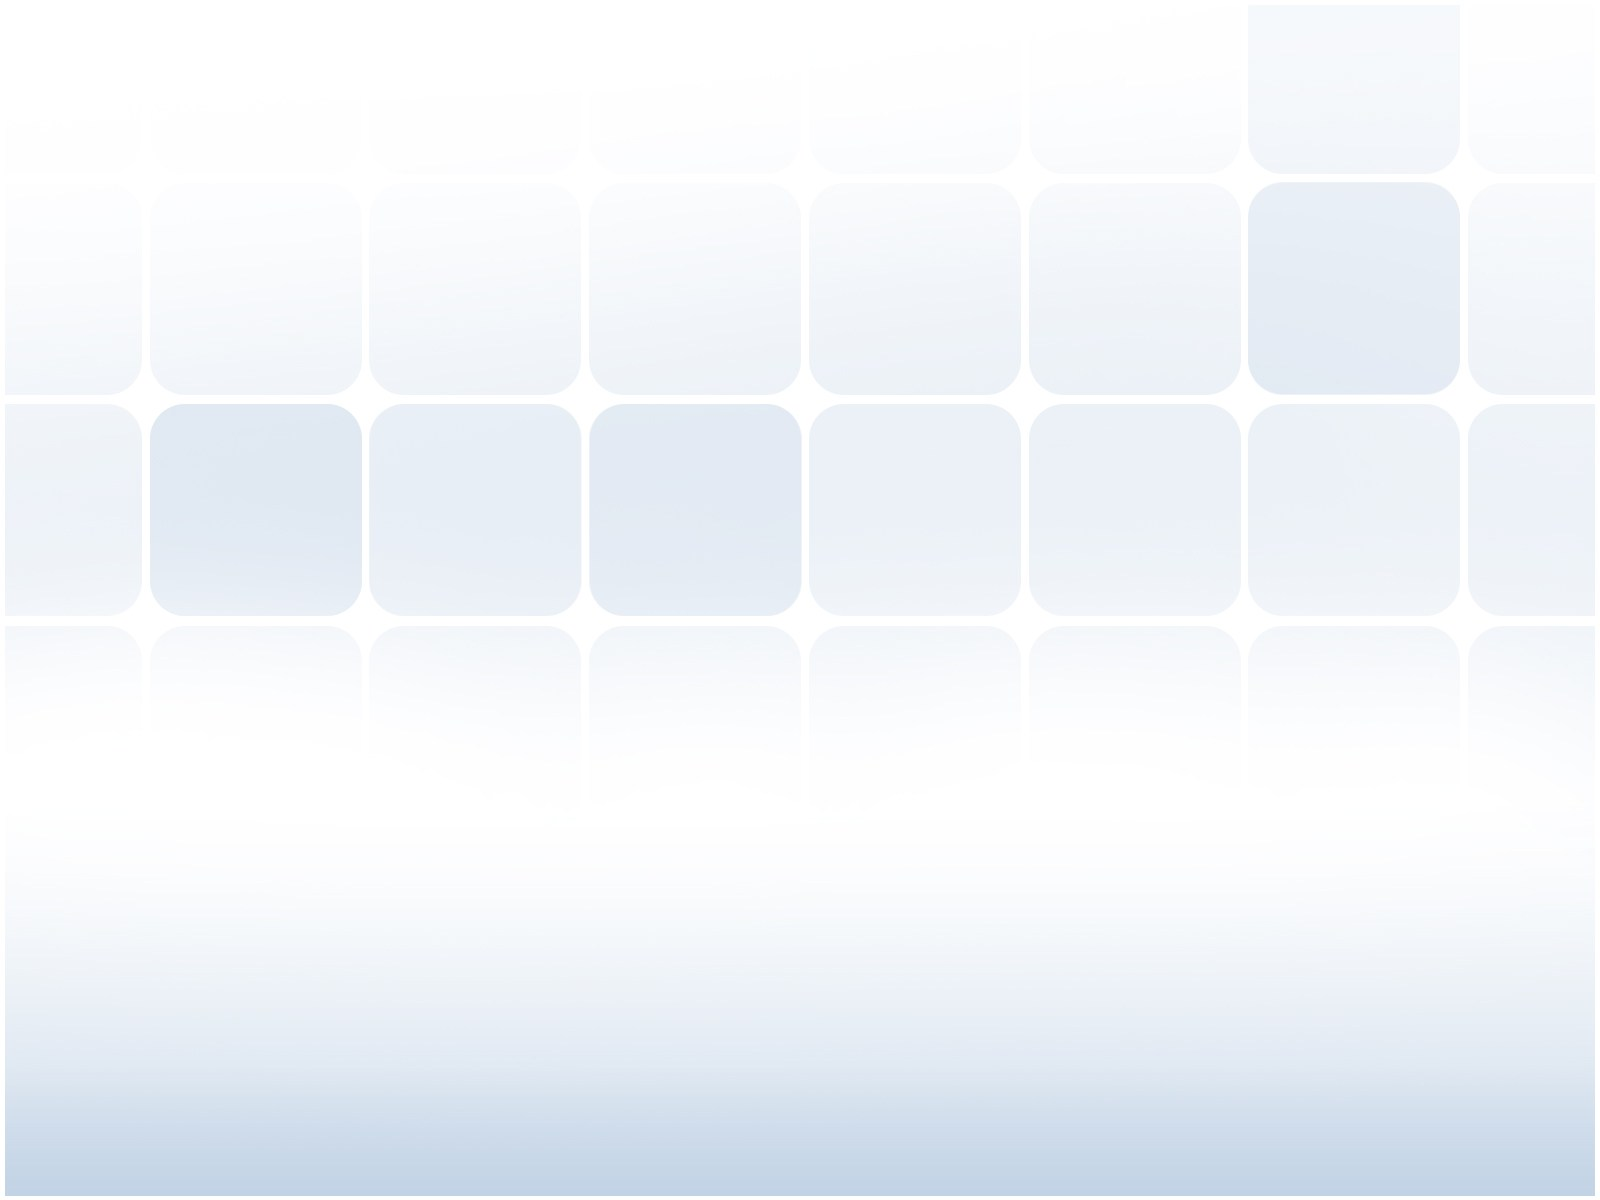 Mẫu nền powerpoint trắng đẹp